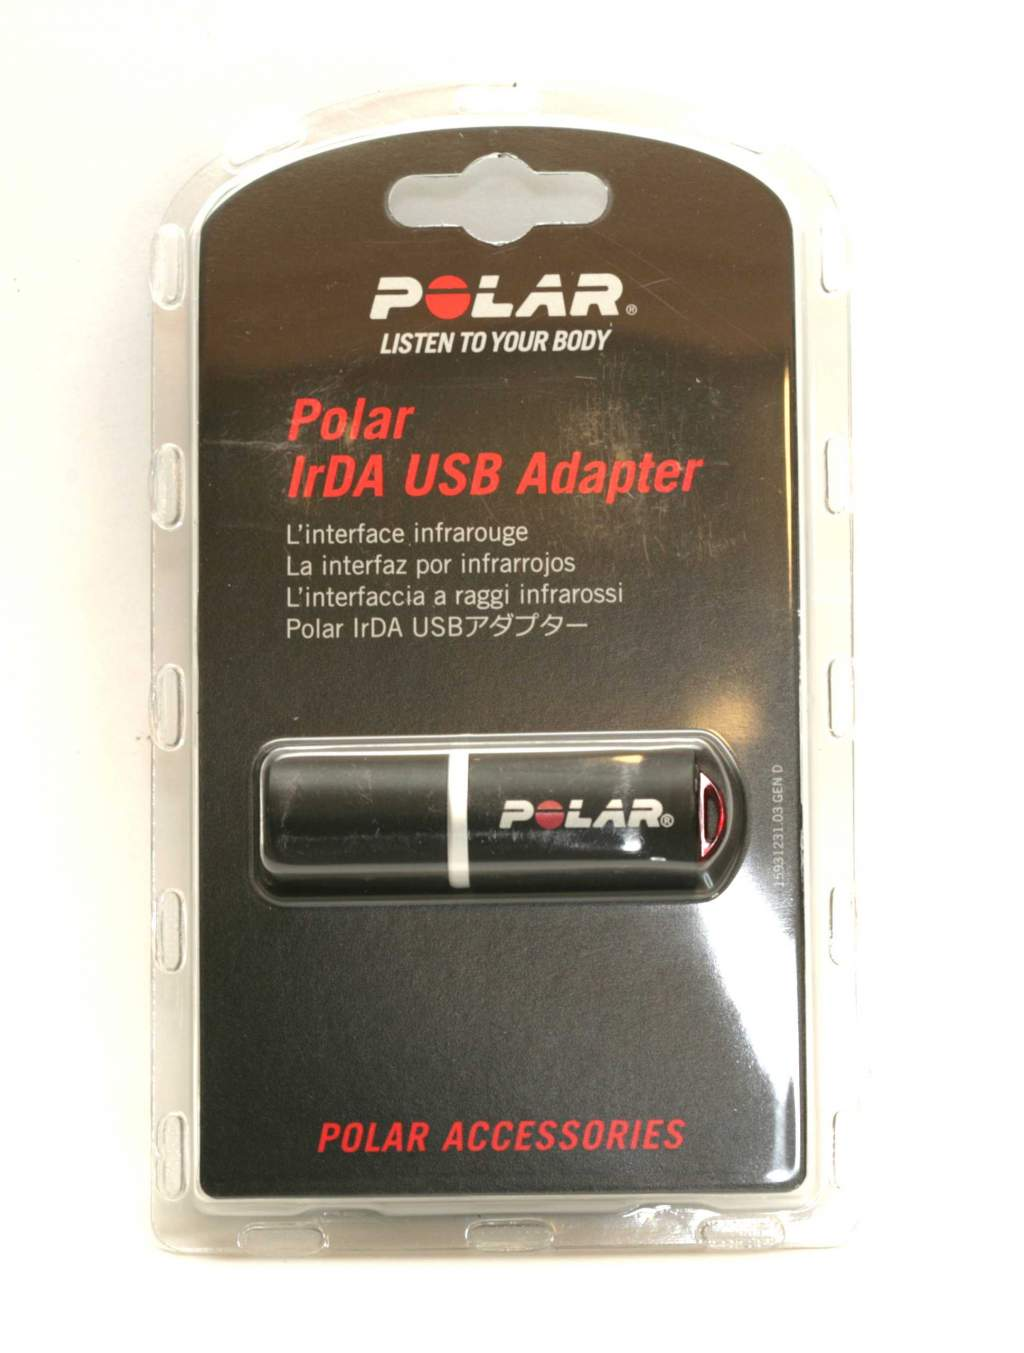 Polar IrDA USB Adapter